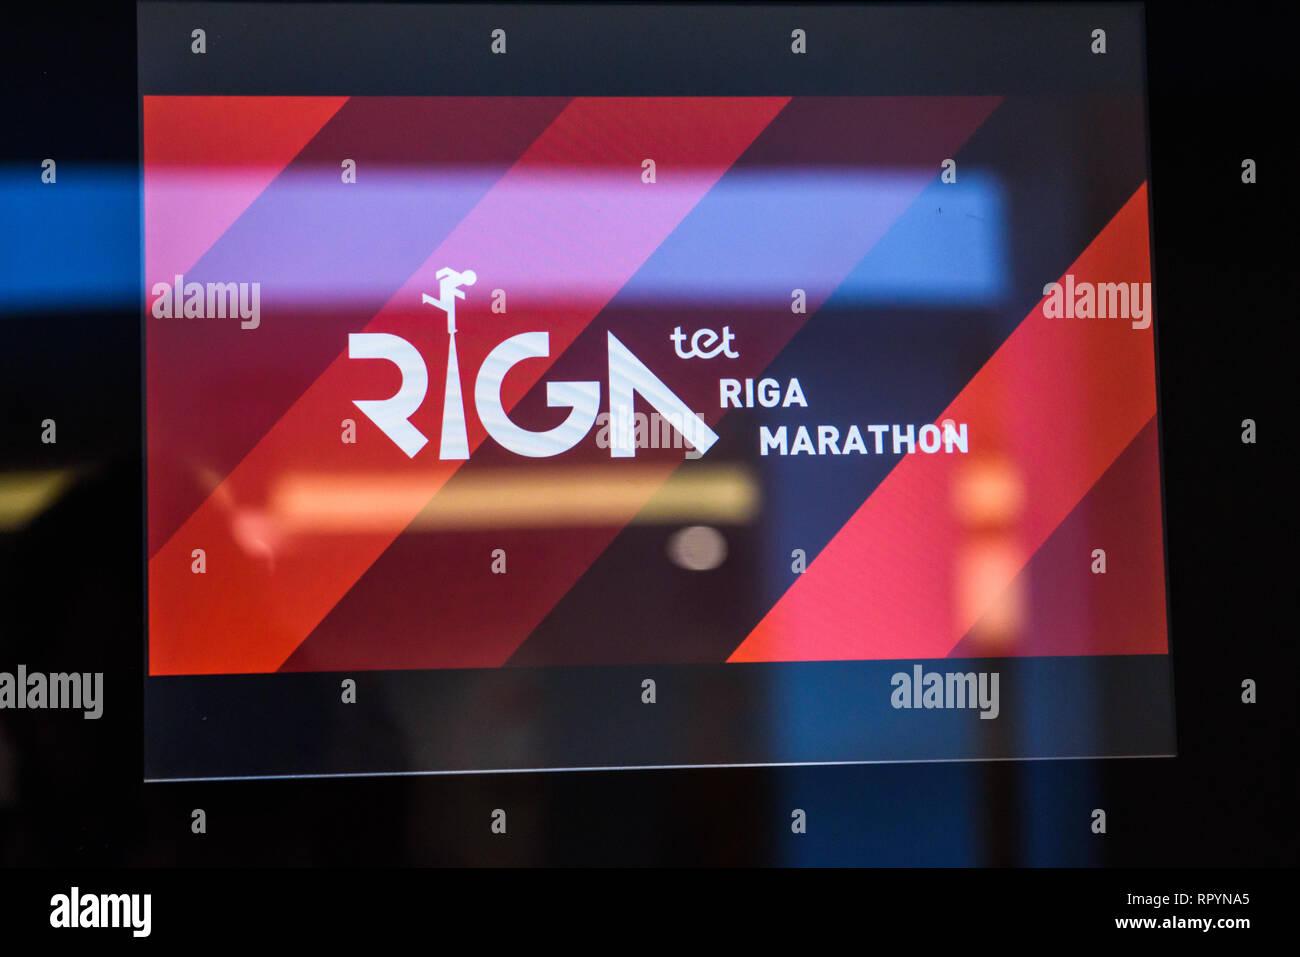 23 02 2019  RIGA, LATVIA  Logo of TET RIGA MARATHON, during